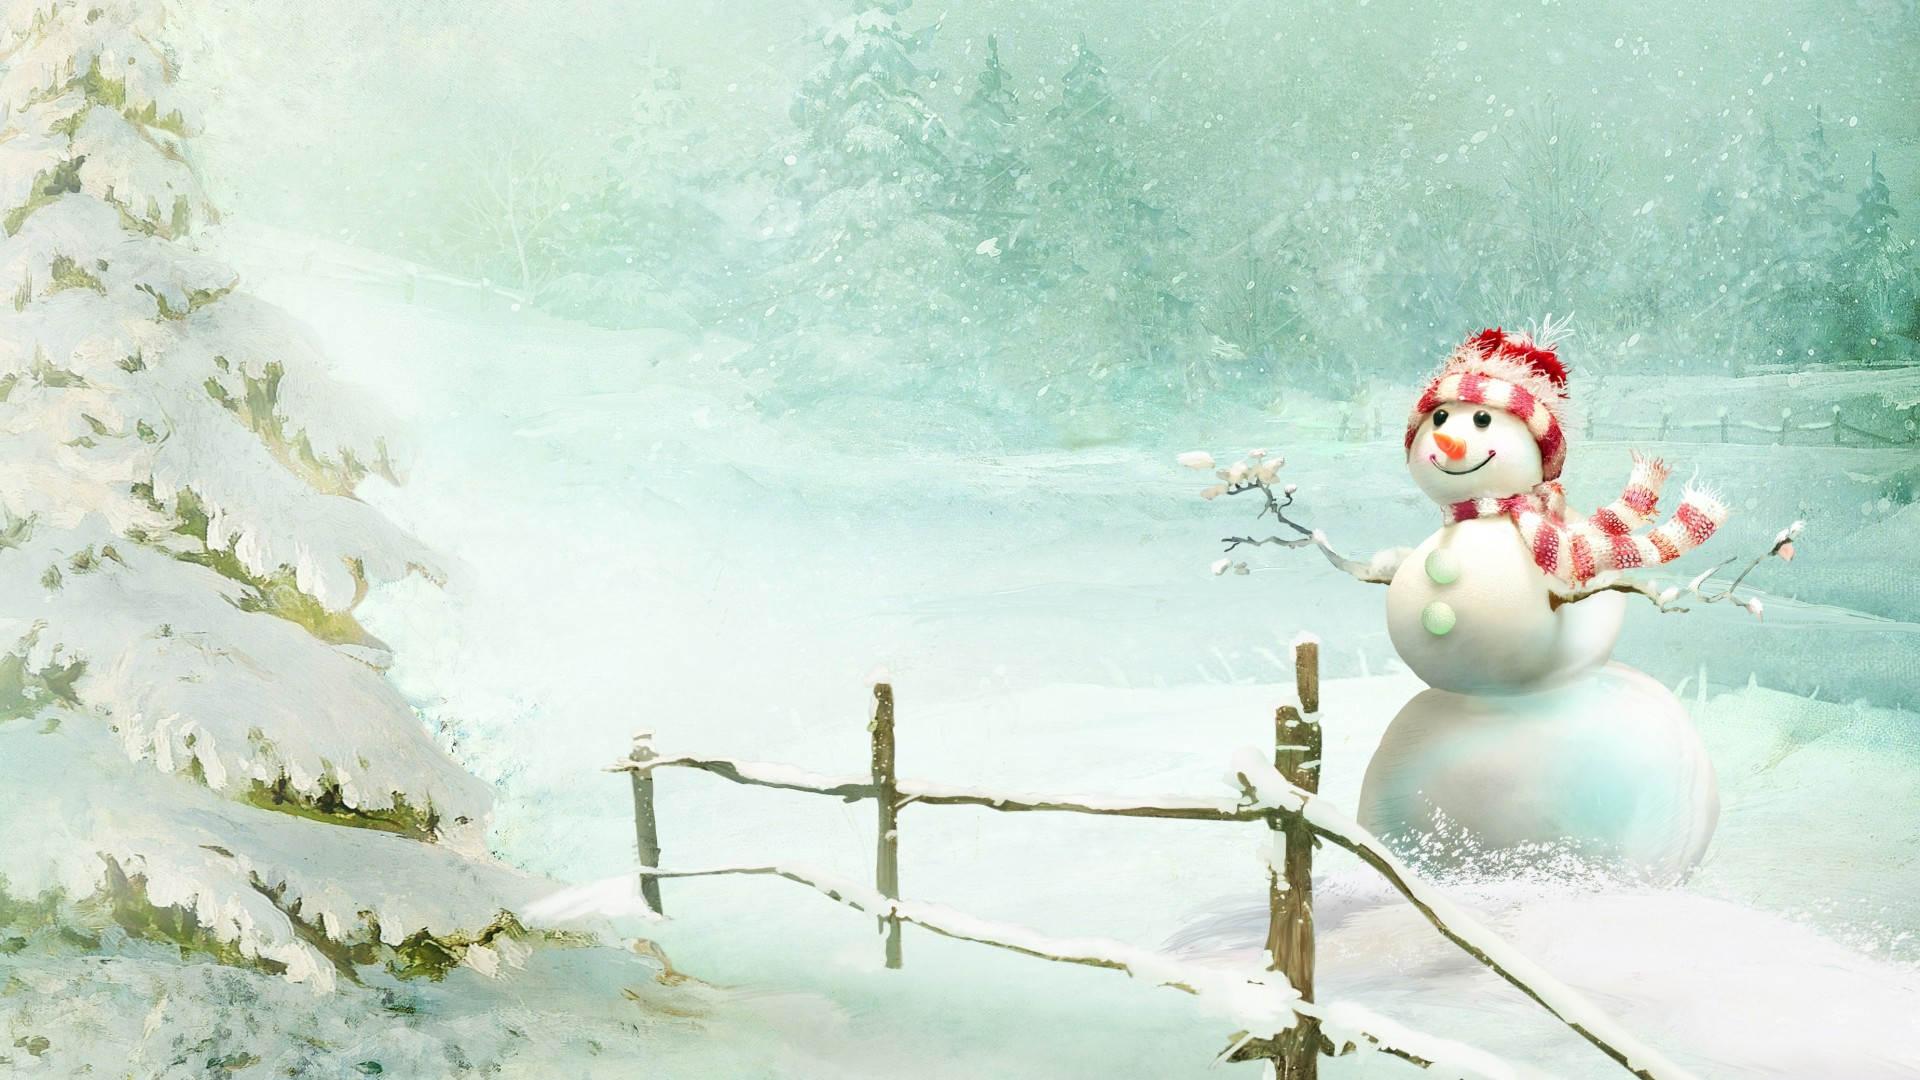 Snowman-In-Snow-Winter-Wallpaper